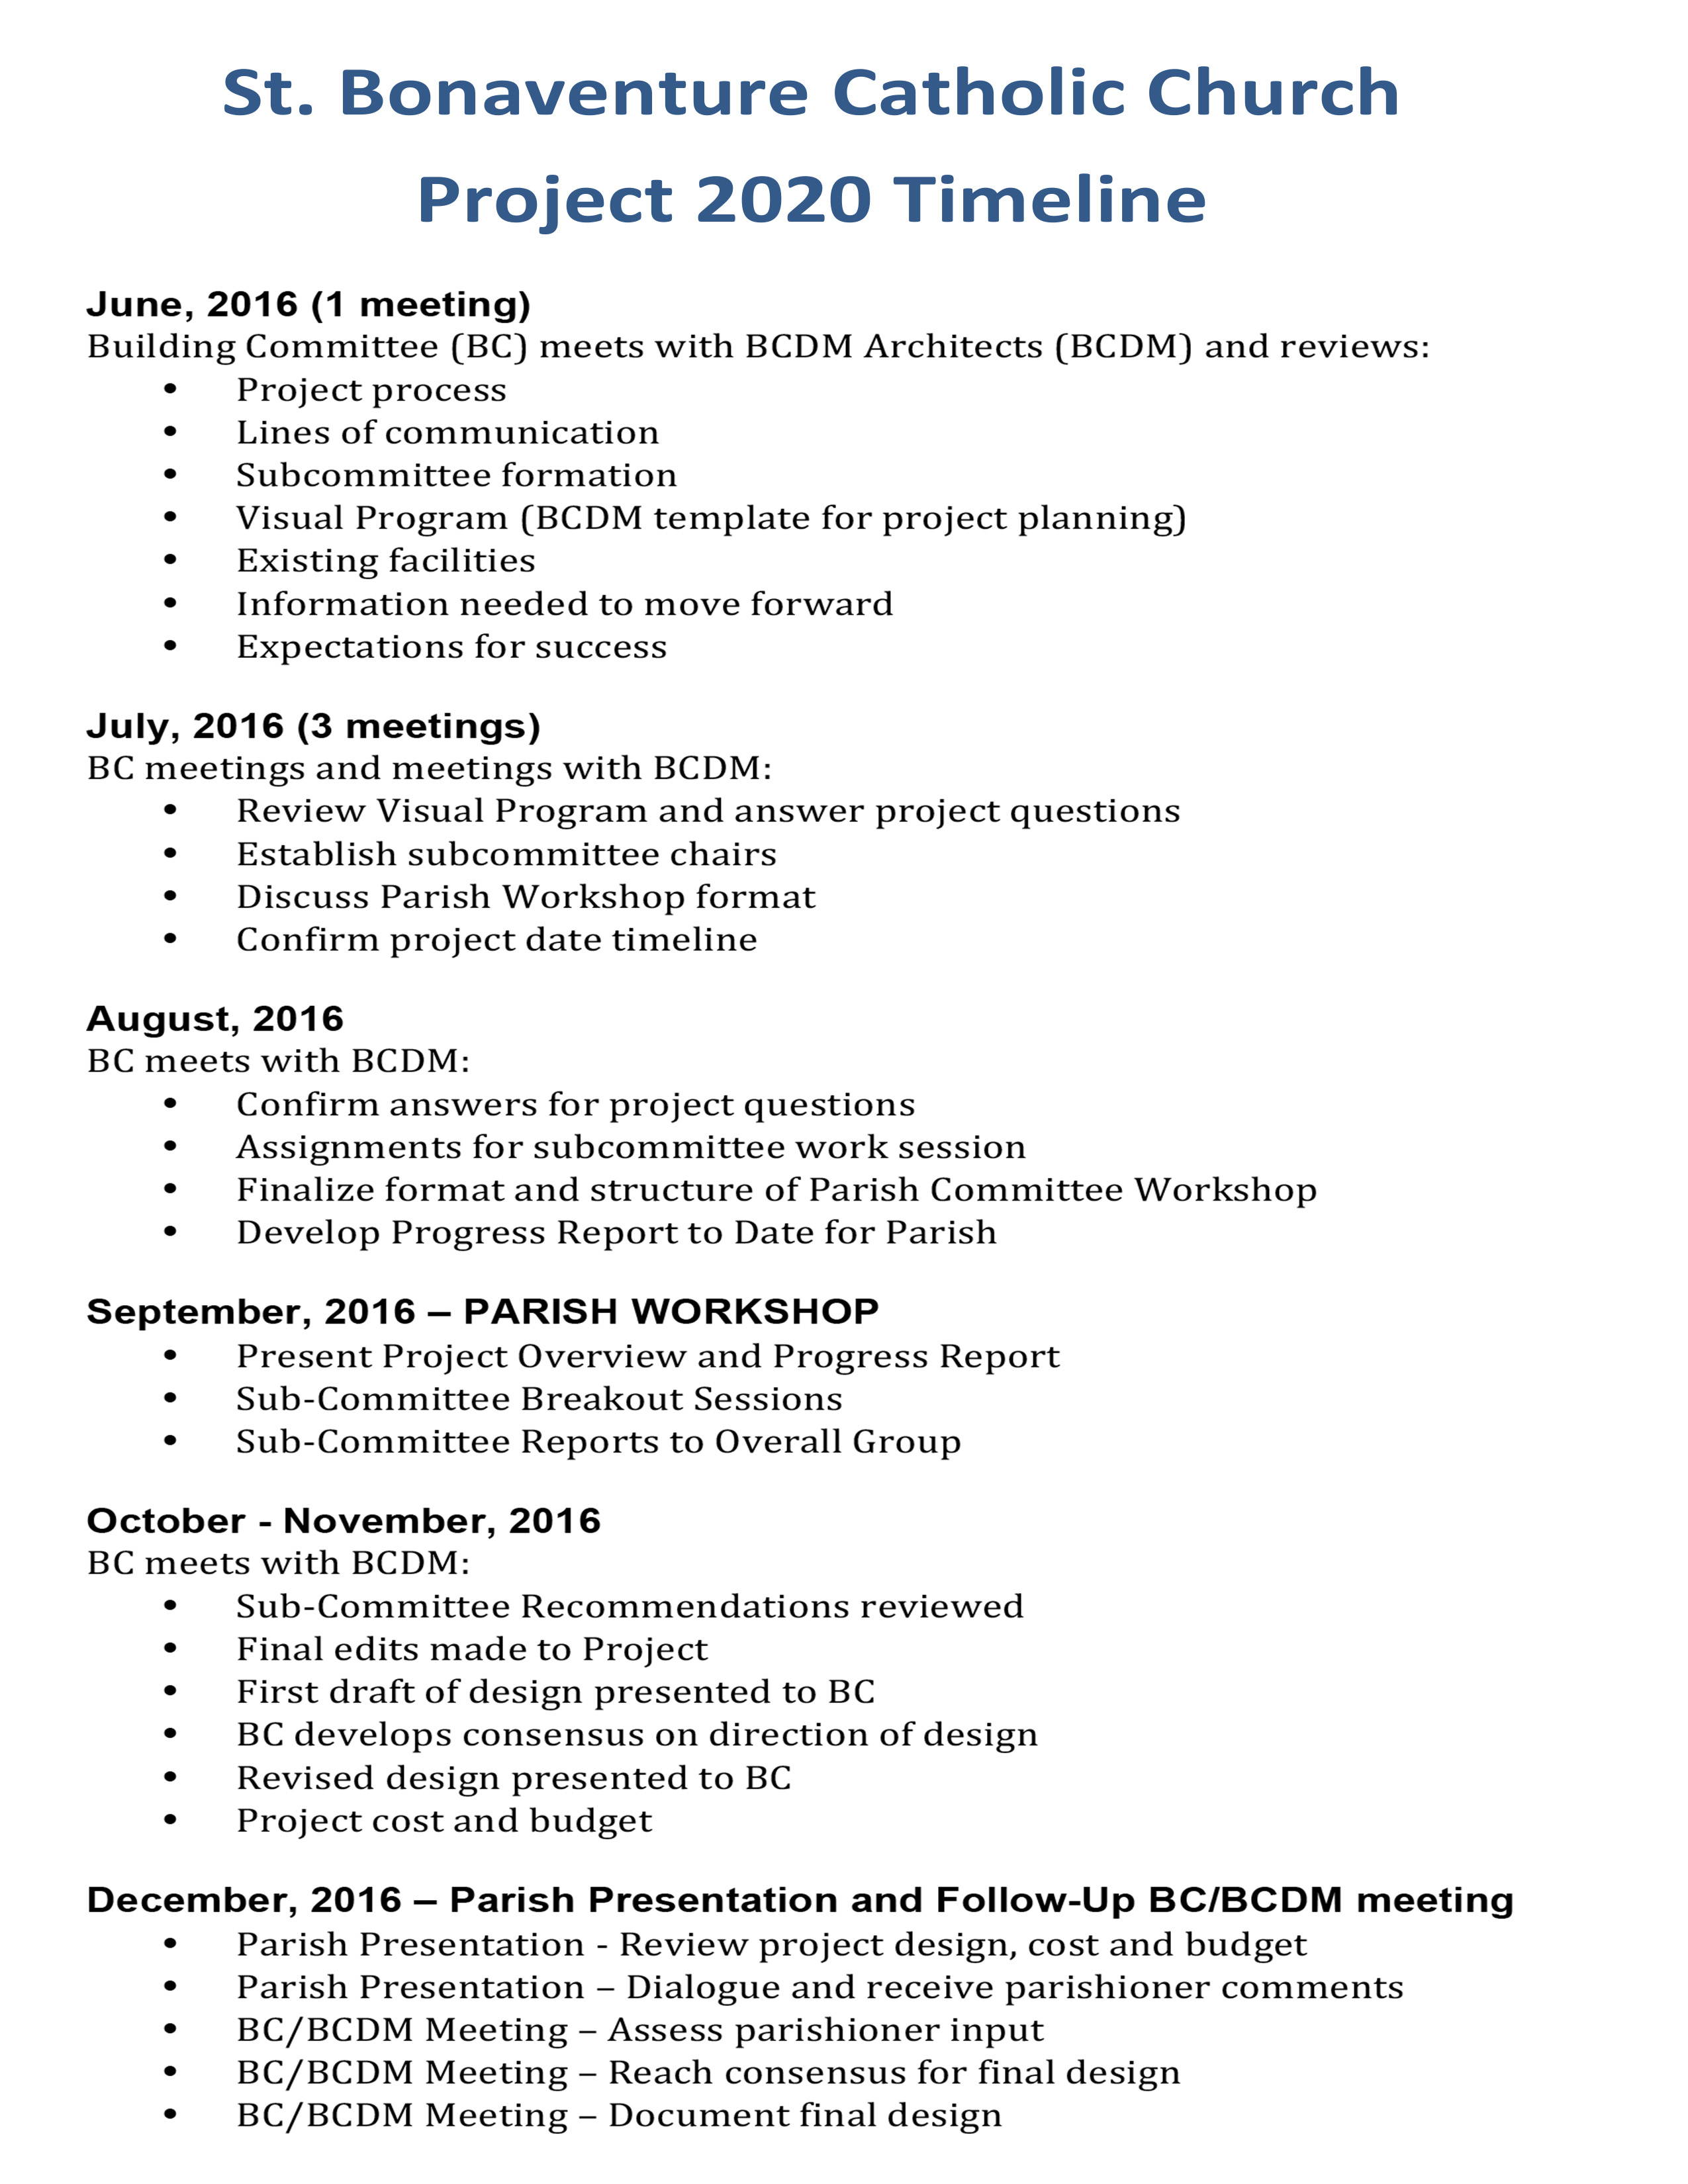 Project 2020 Timeline - Saint Bonaventure Catholic Church